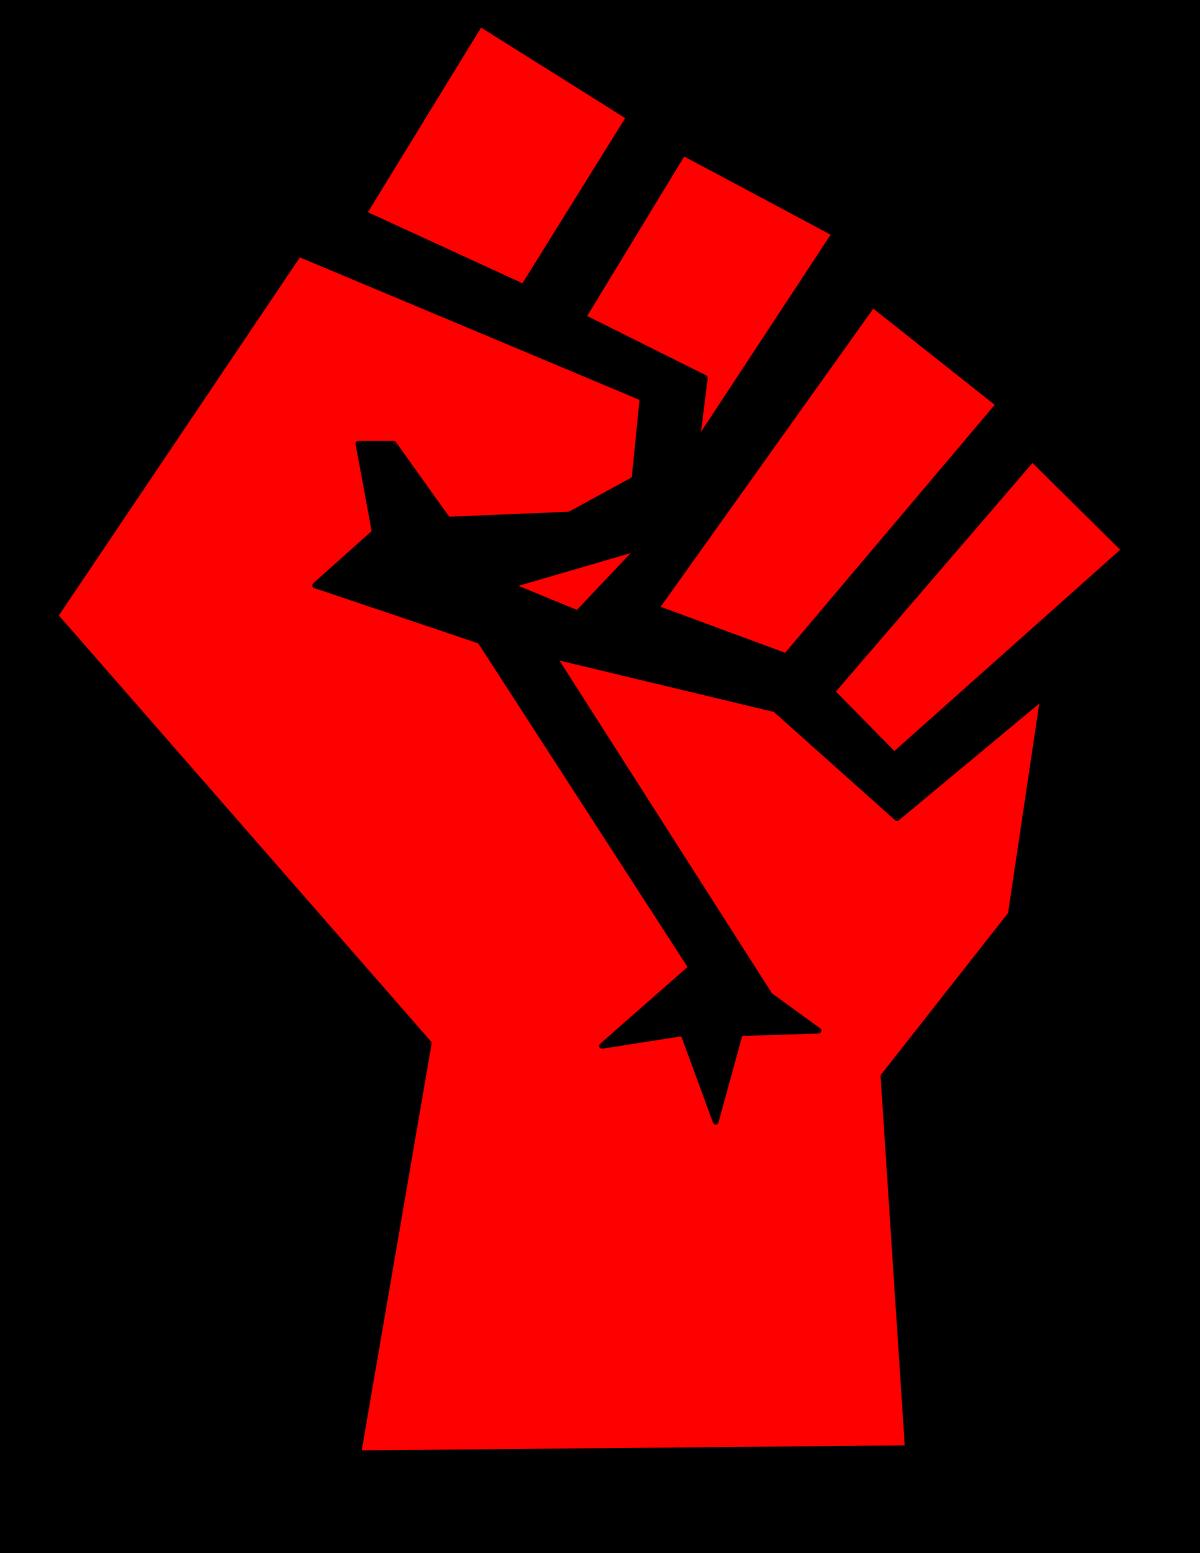 International socialist tendency wikipedia. Democracy clipart revolution fist